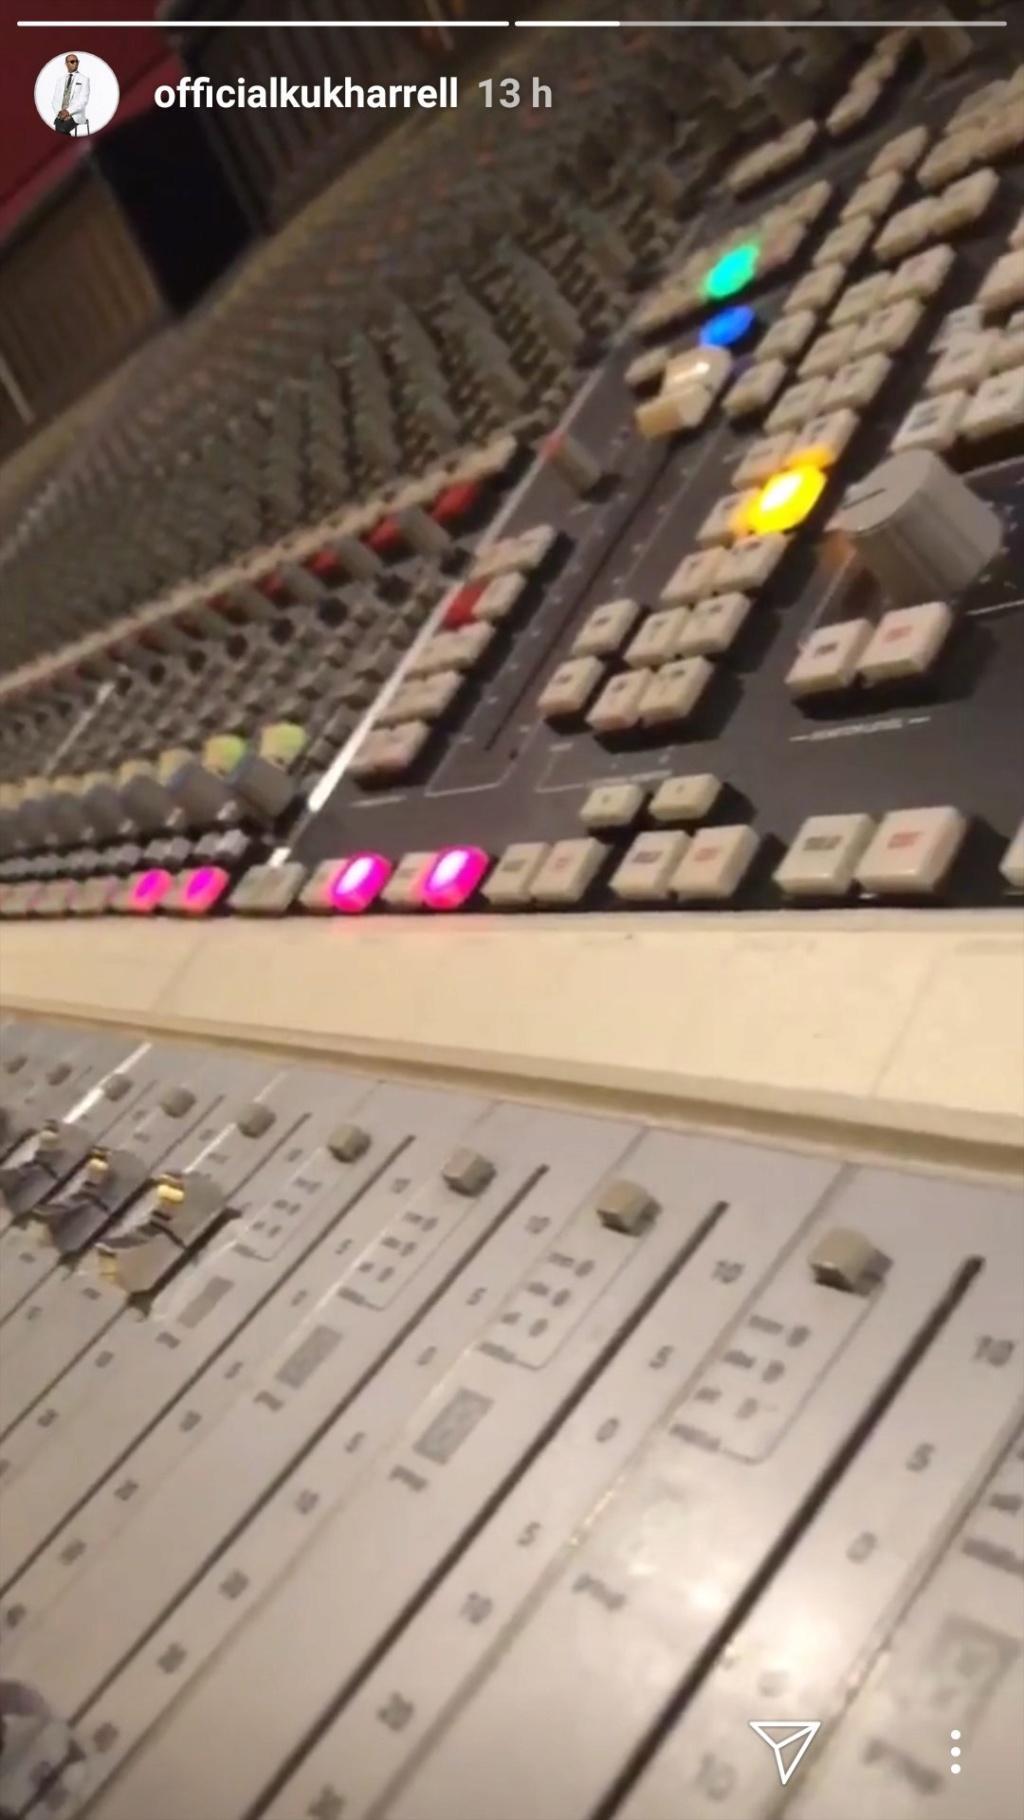 Rihanna >> preparando nuevo álbum - Página 19 Img_2069